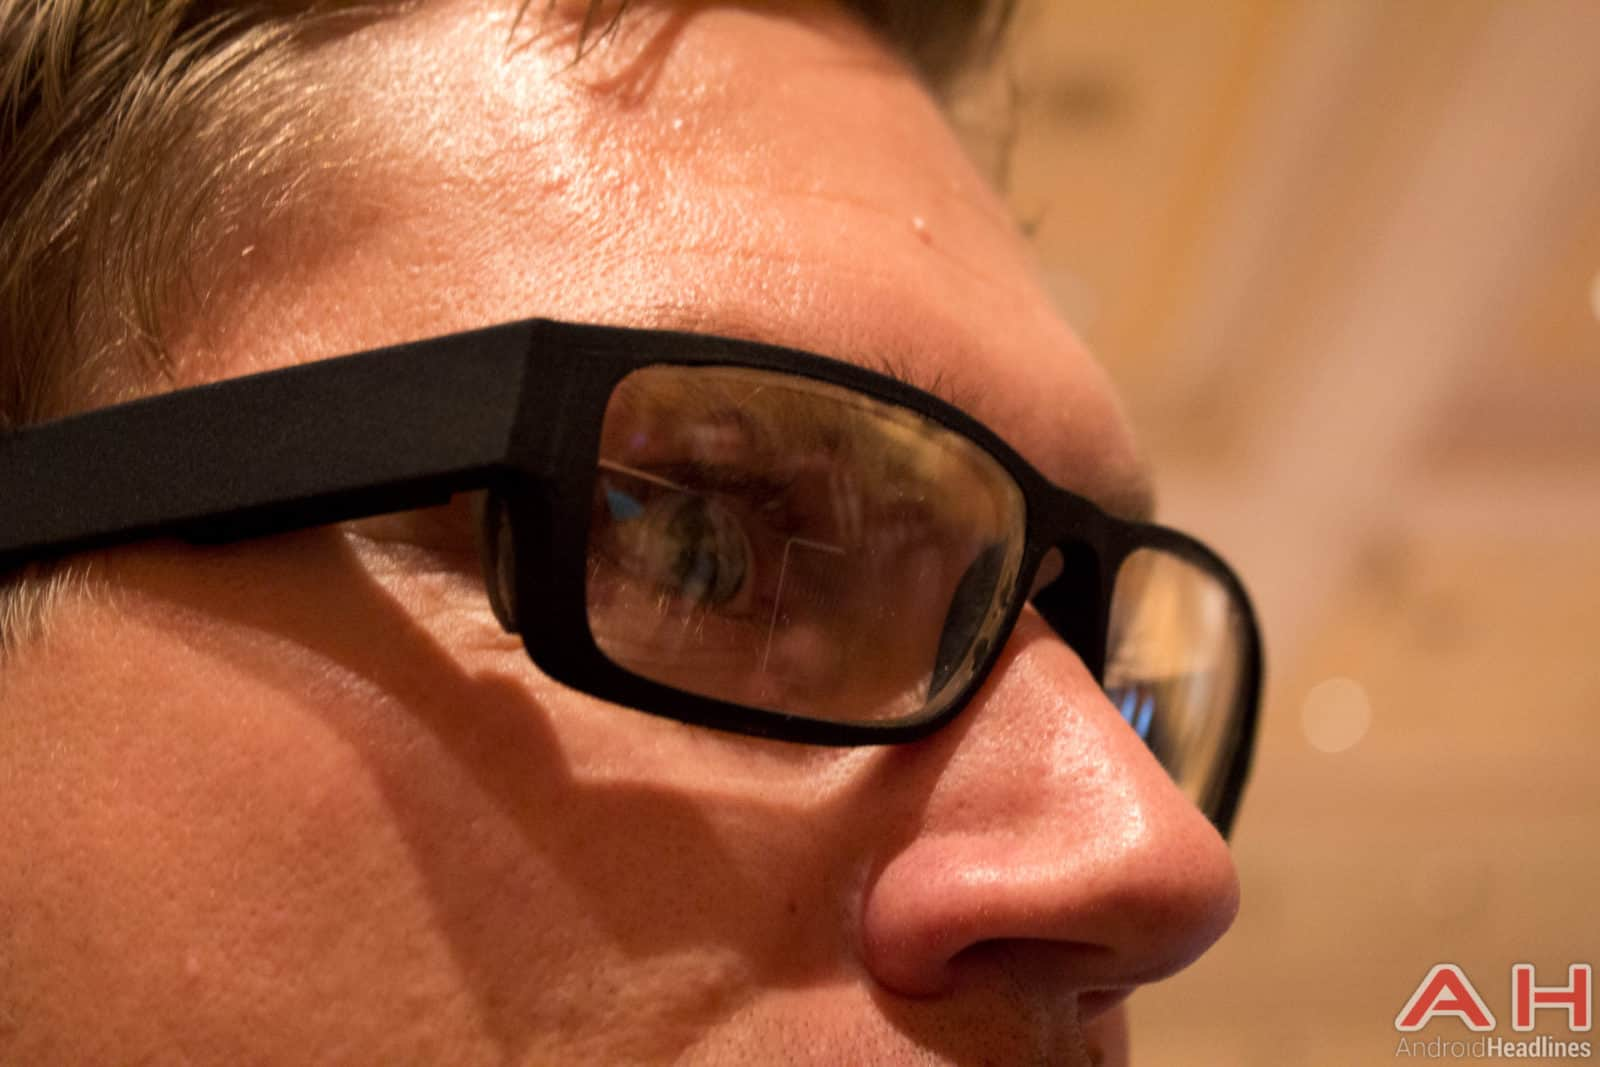 Carl Zeiss Glasses AH (4)